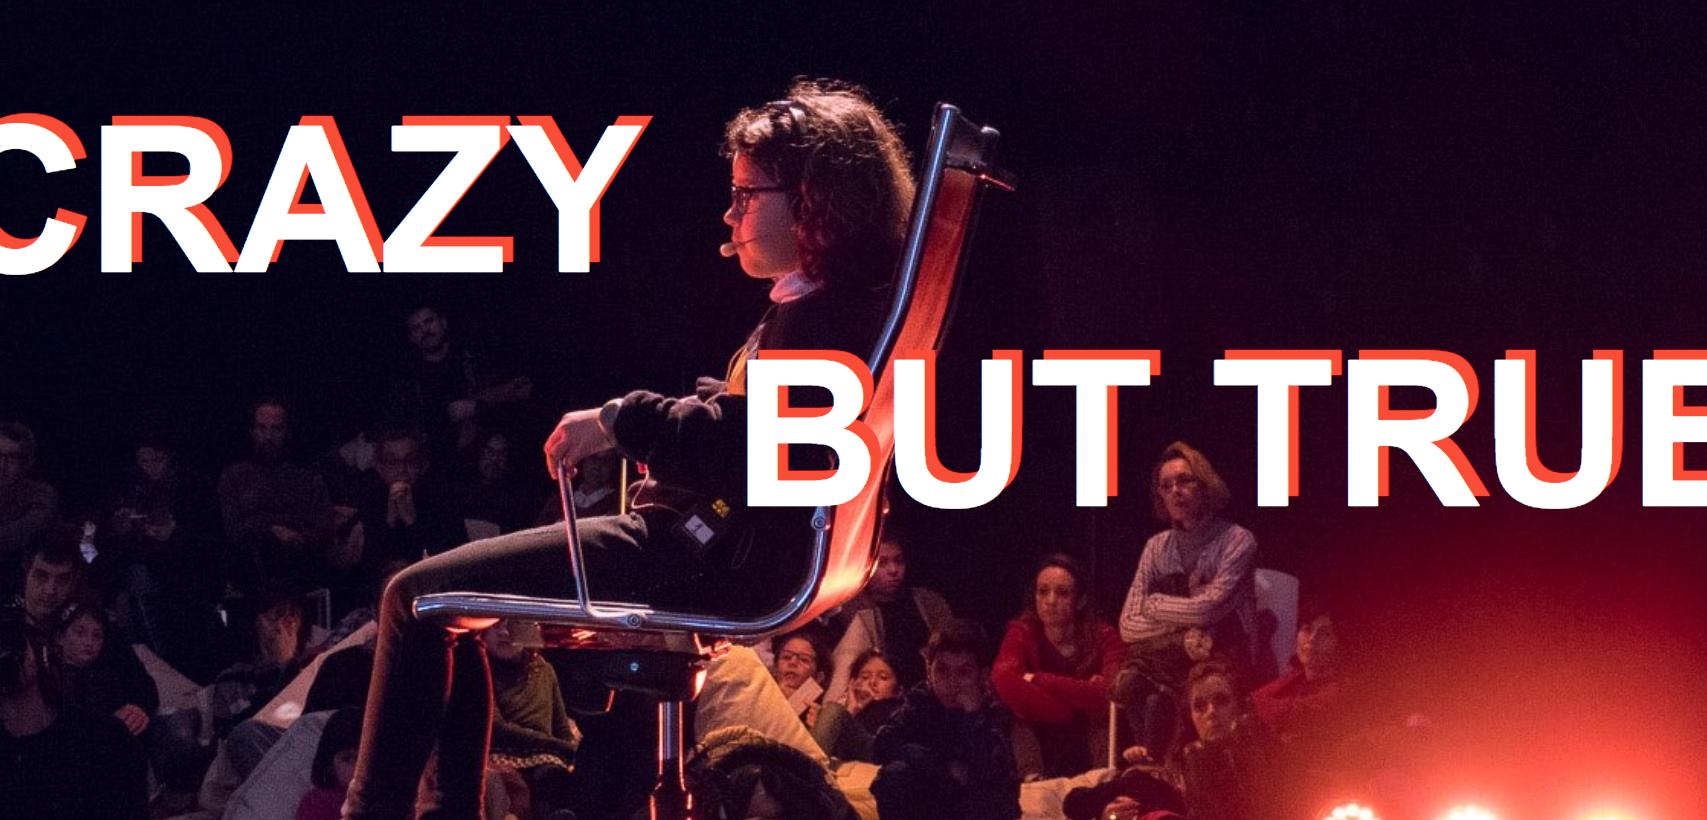 Crazy But True (2016-2017, Ant Hampton)